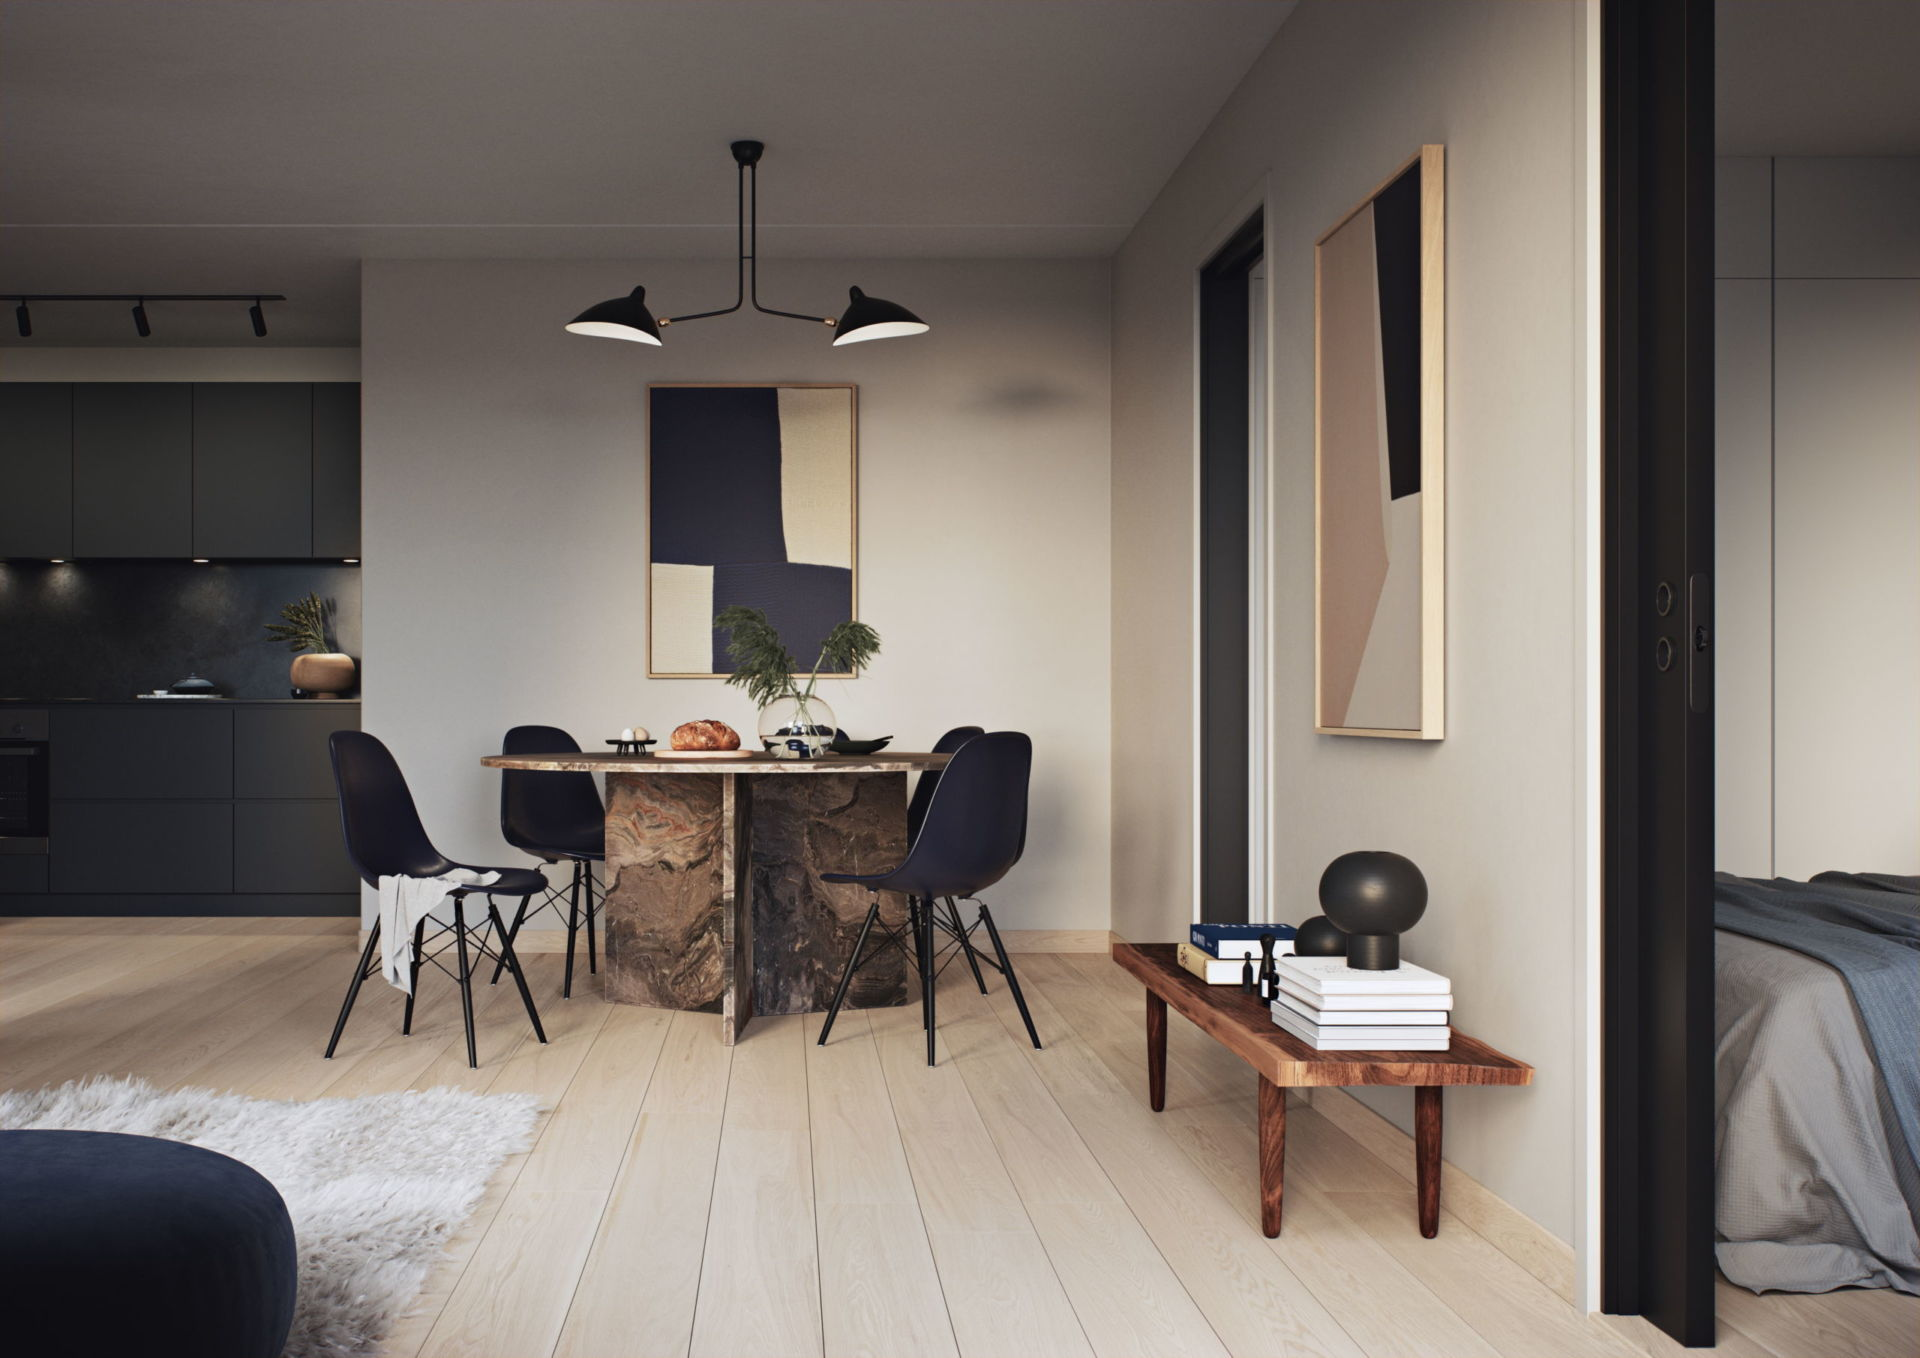 Arnljot_Gellines_vei_A0602_Livingroom